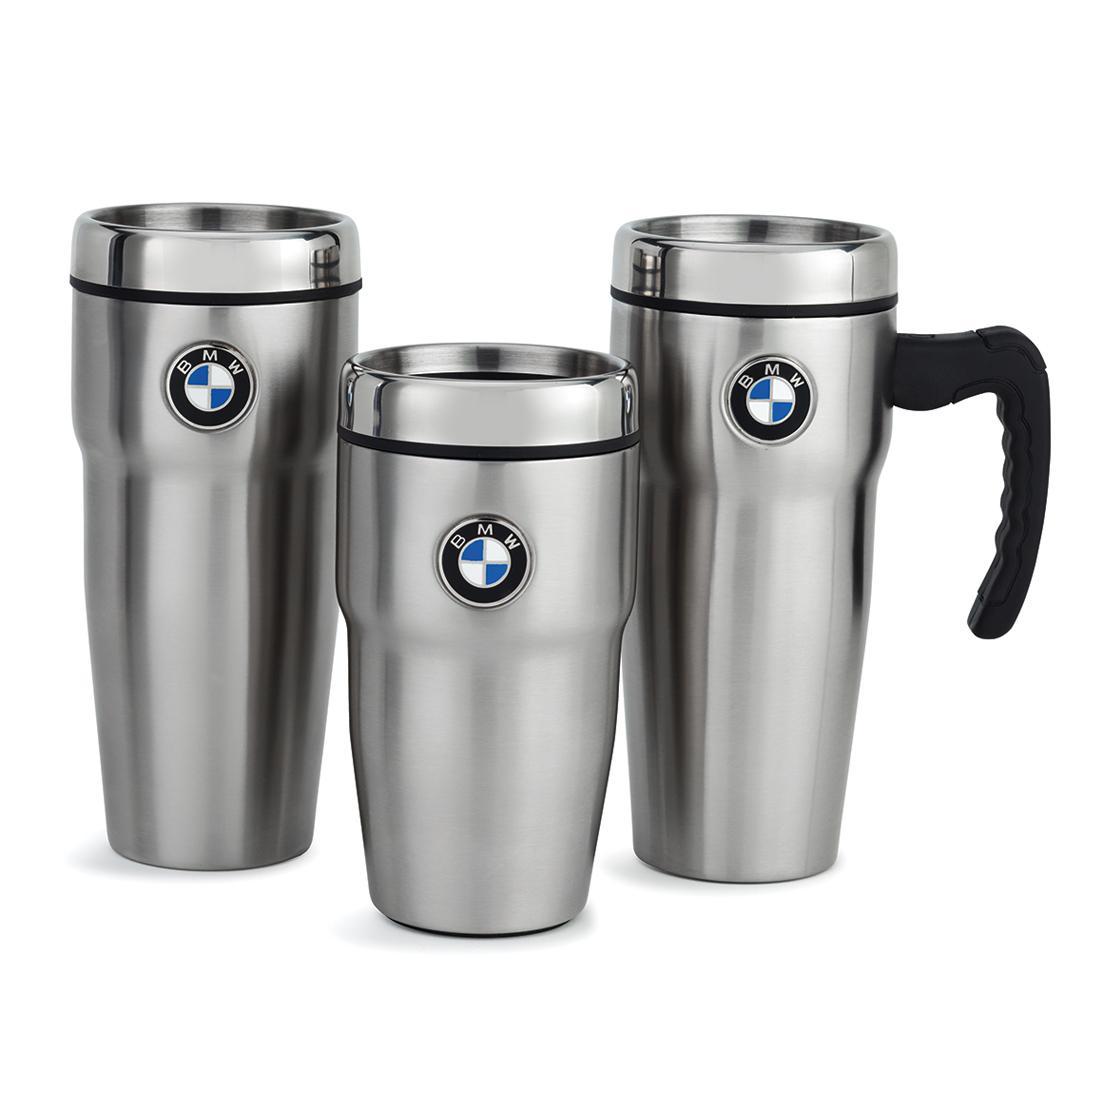 f264704030f ShopBMWUSA.com: BMW ROUNDEL TRAVEL MUG